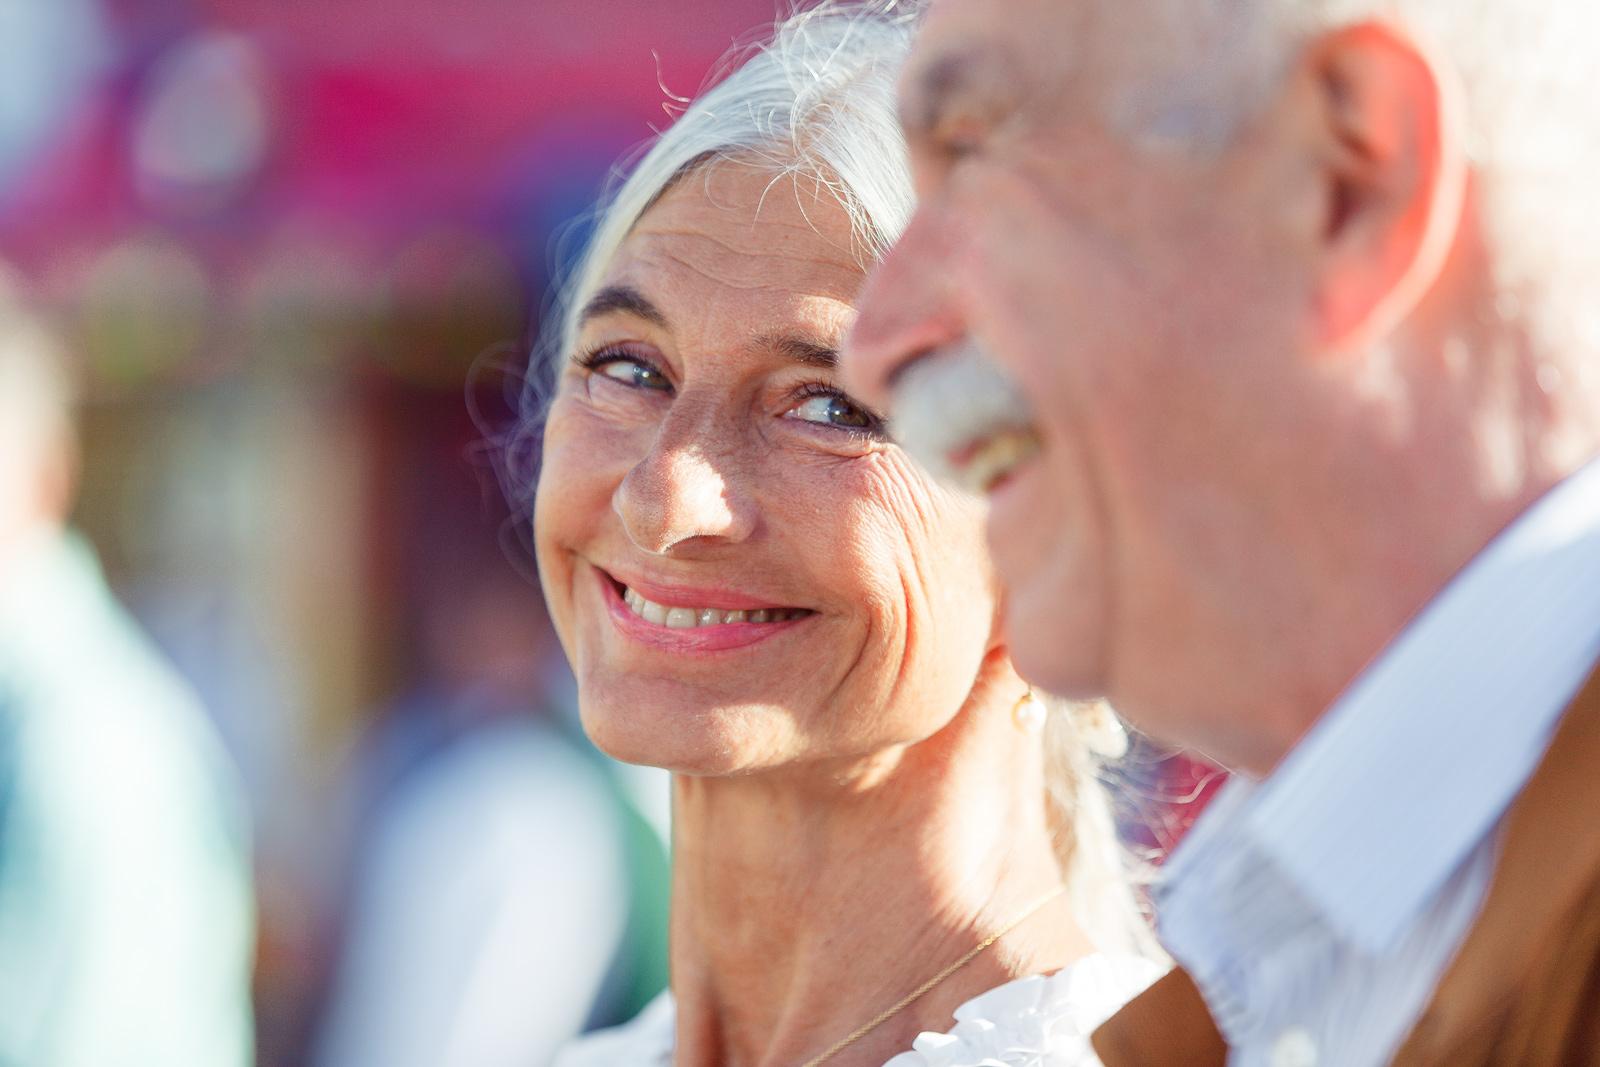 verliebter Blick eines alten Ehepaares